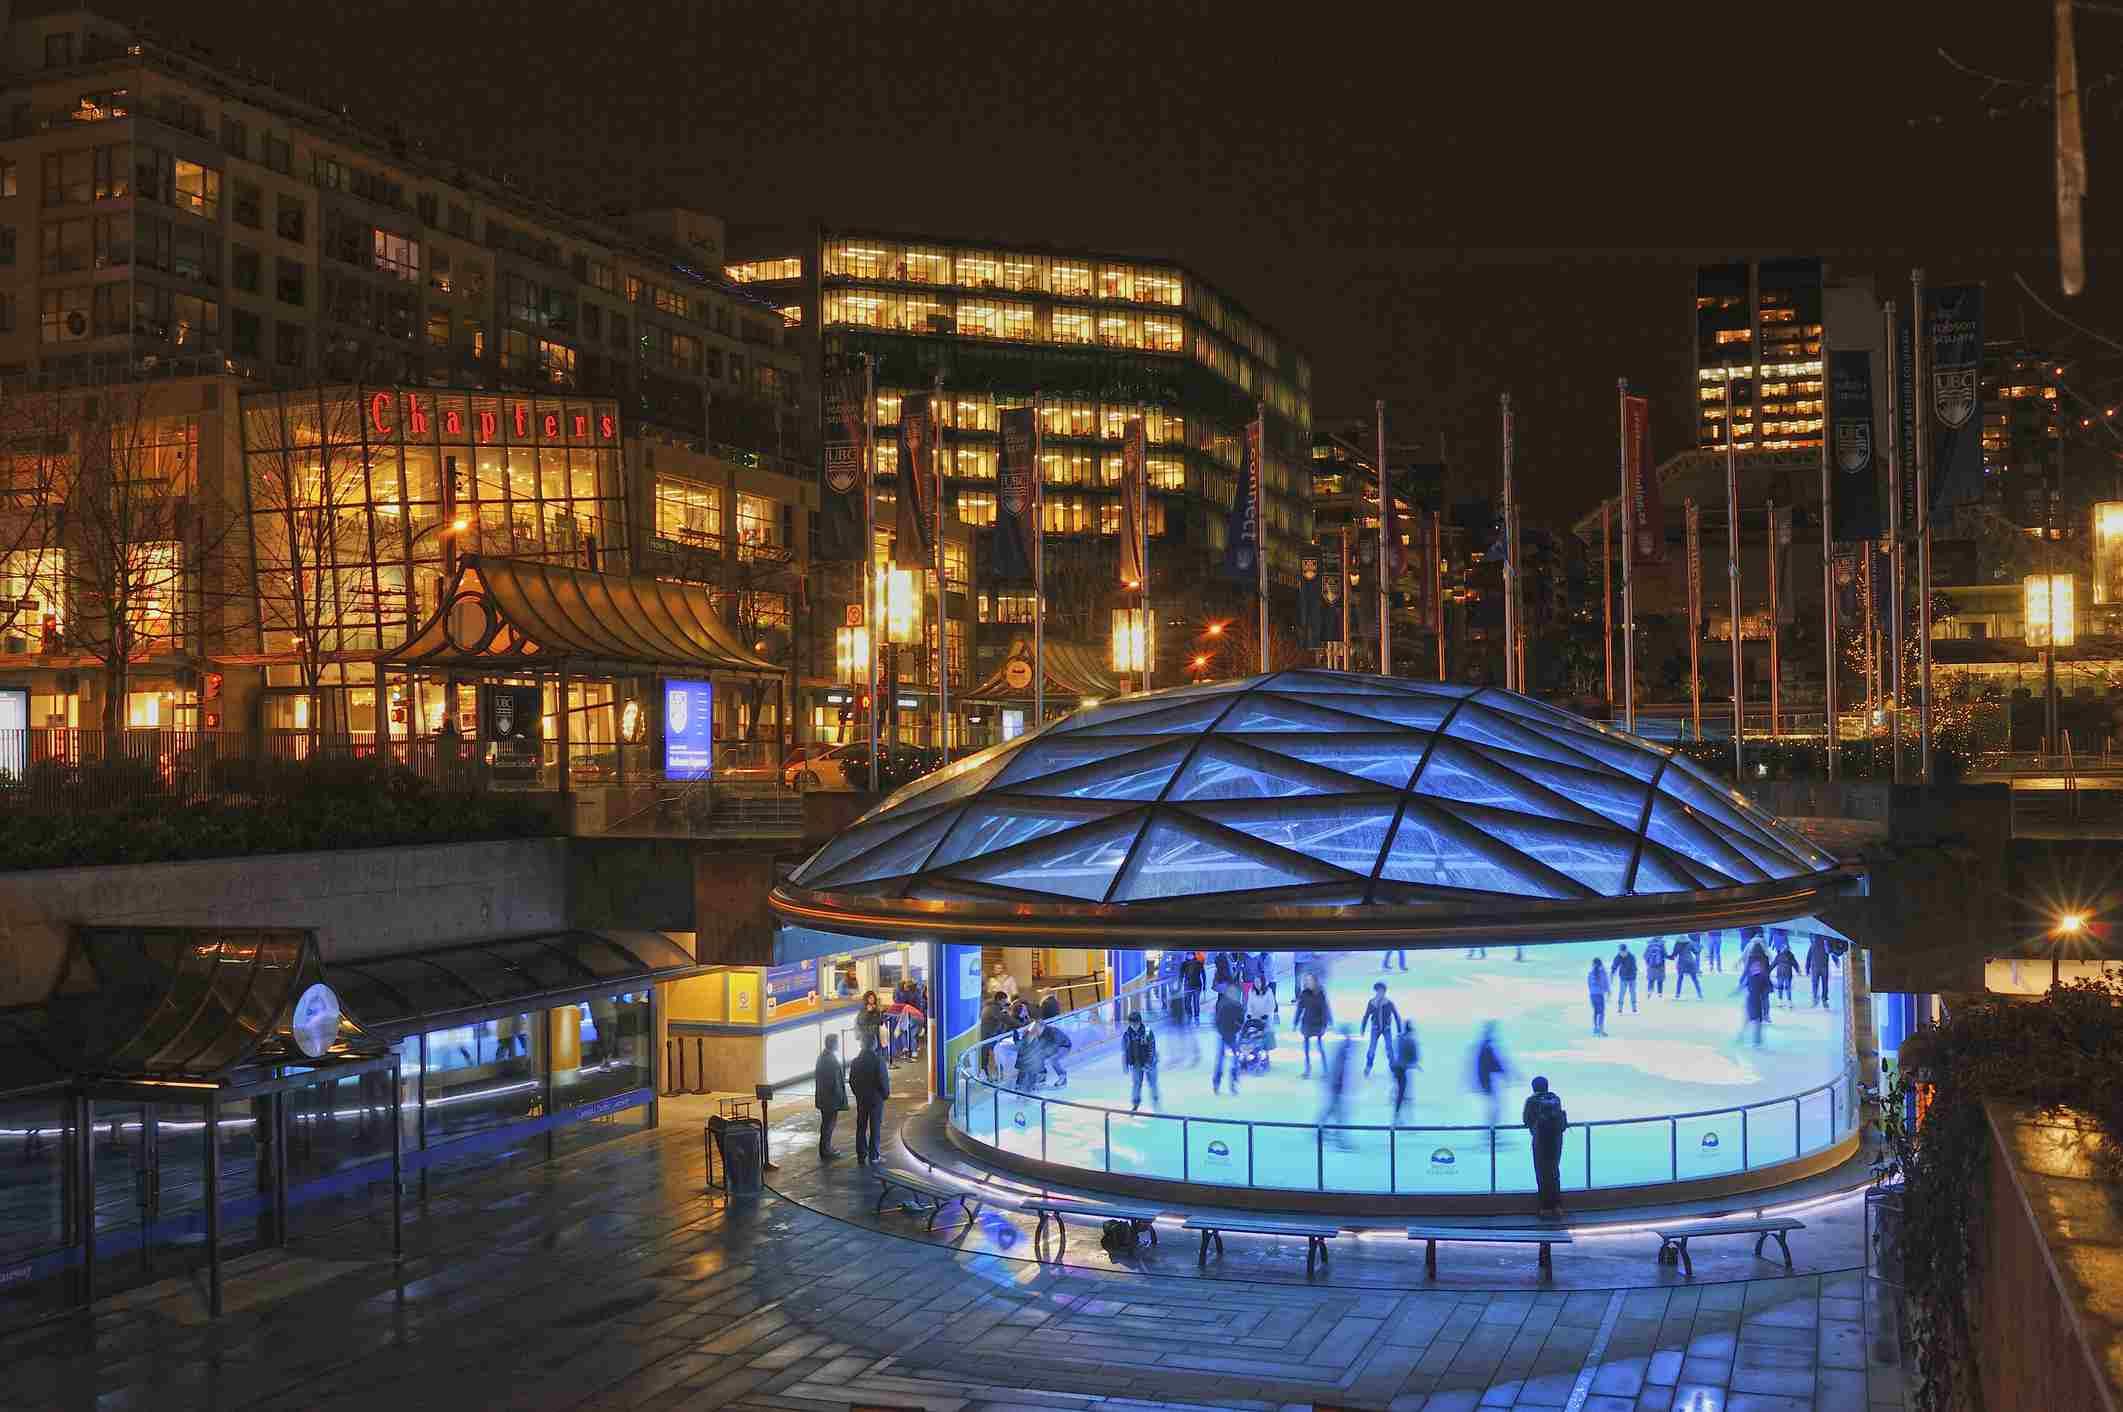 Robson Square Ice Skating Rink, Vancouver, British Columbia, Canada